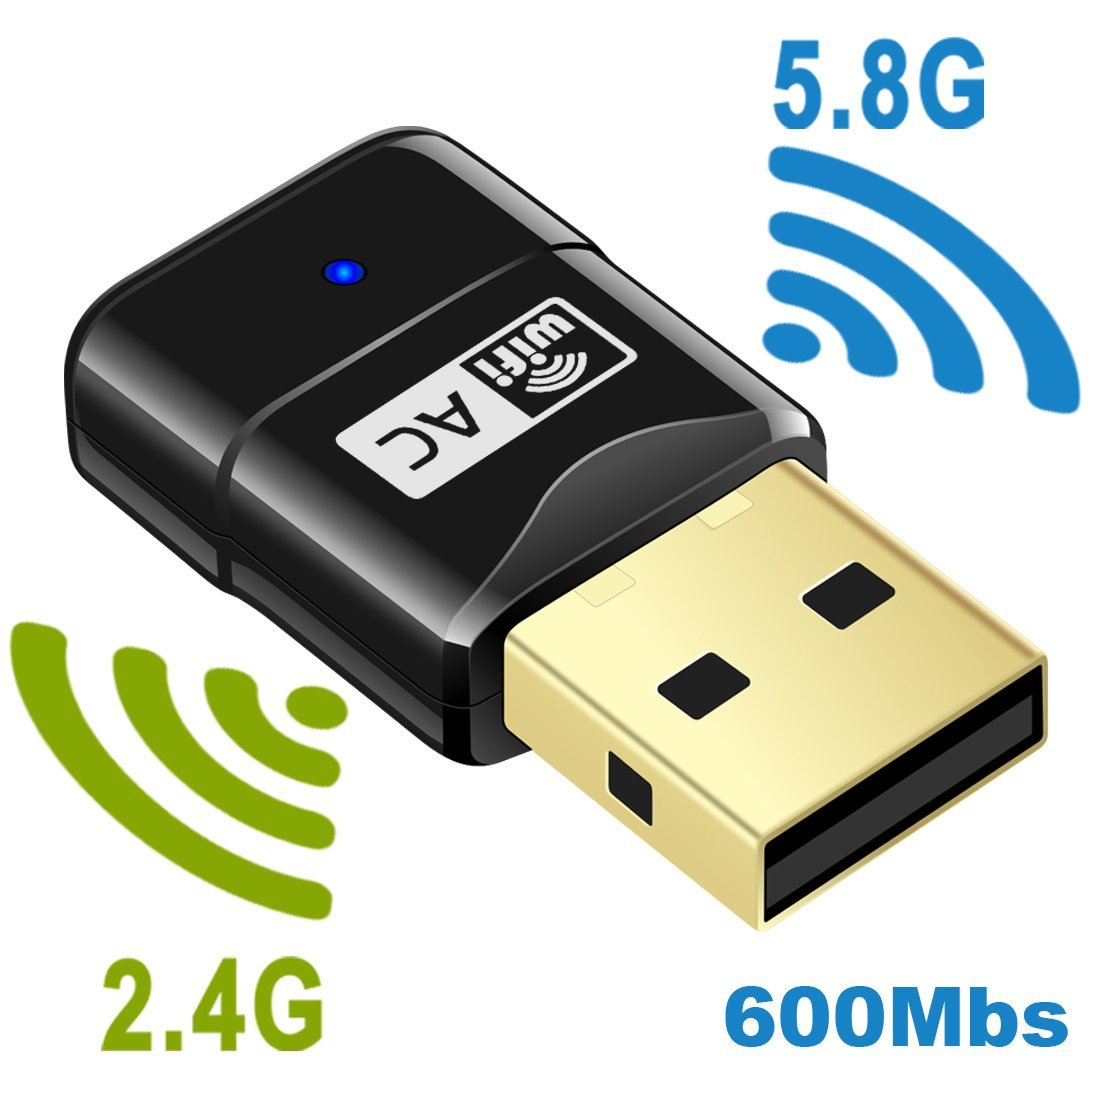 WiFi Adapter AC600 Wireless USB Adapter 5G/2.4G Dual Band Network Lan Card 802.11ac Mini USB WiFi Dongle Adapter Mailiya Wireless Network Adapter Support Windows XP/Vista/7/8.1/10/Mac OS X 10.4-10.11